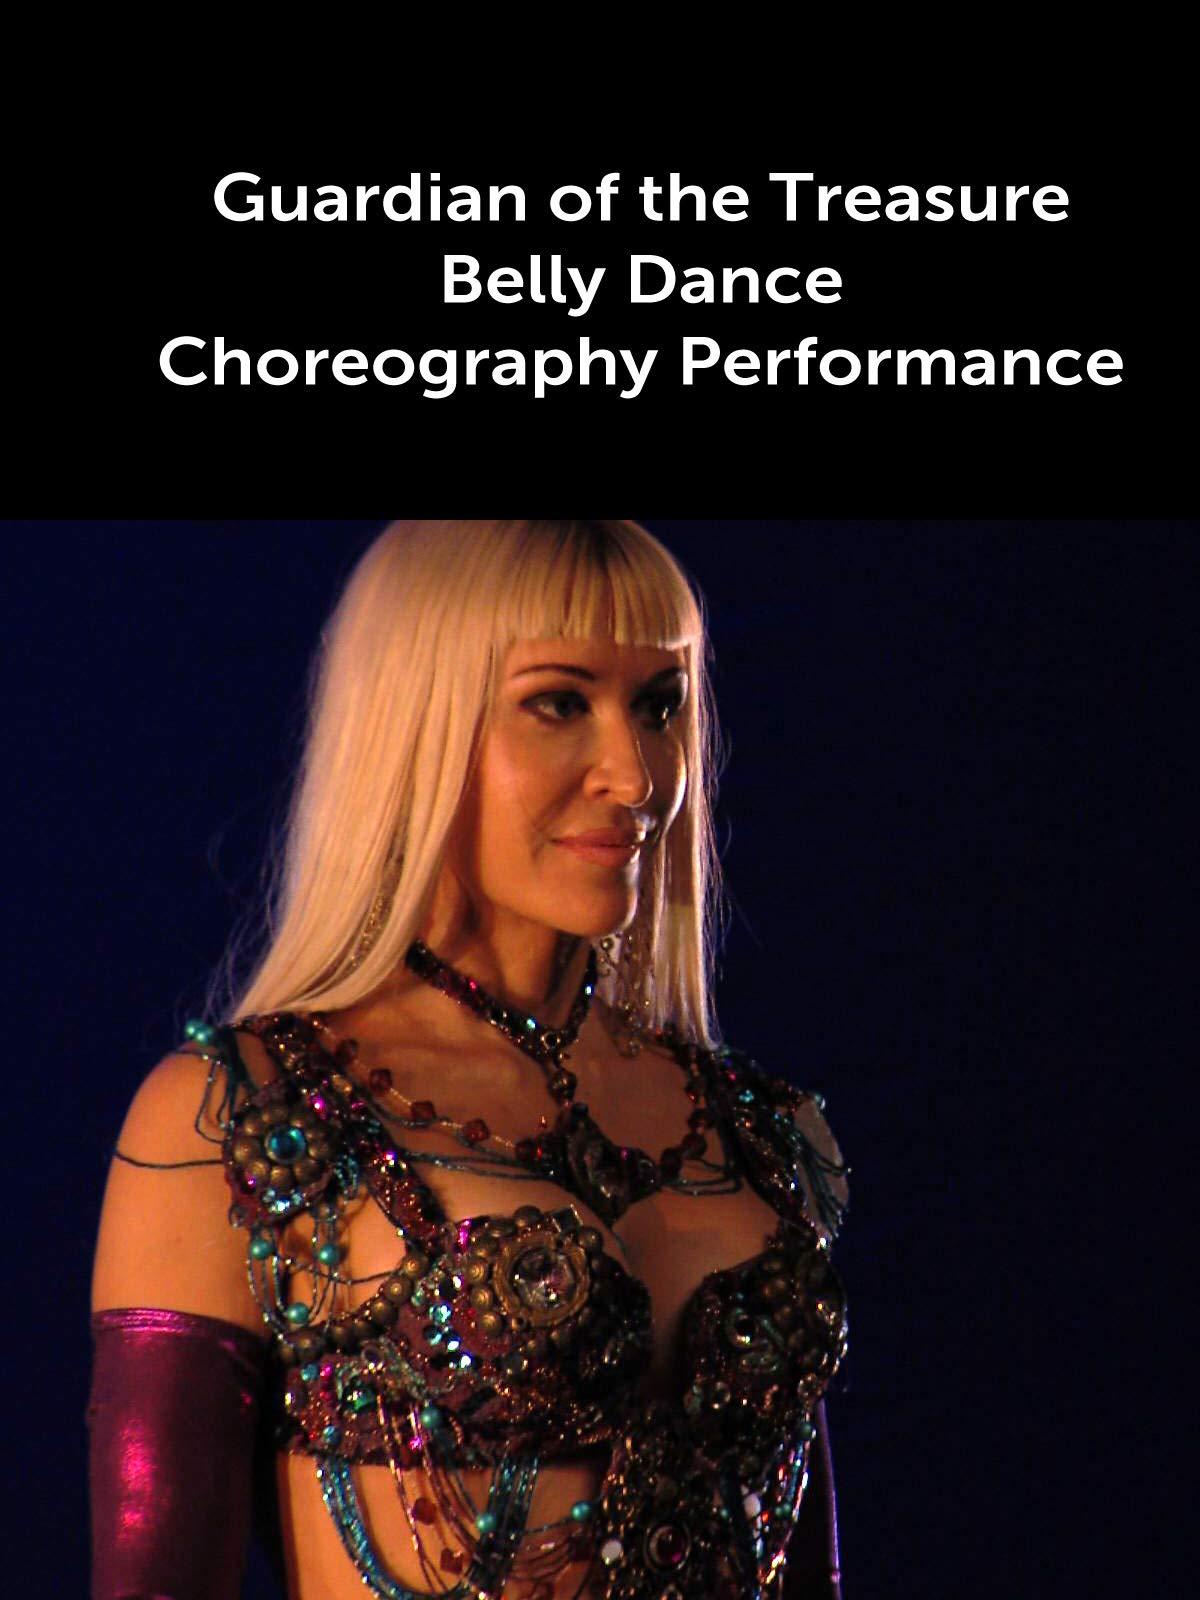 Guardian of the Treasure Choreography Performance on Amazon Prime Video UK